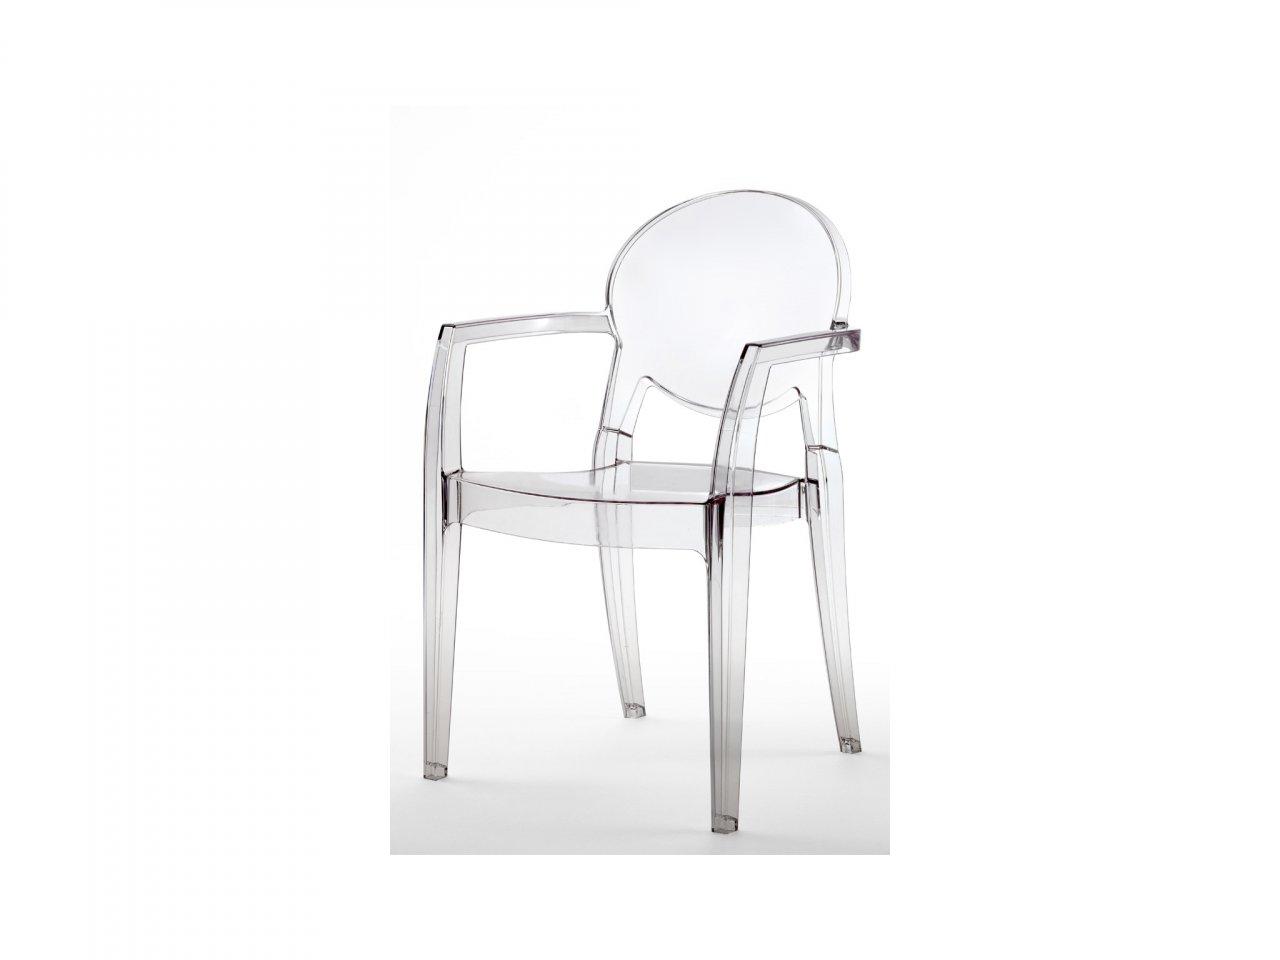 Sedia Con Braccioli Igloo - v1